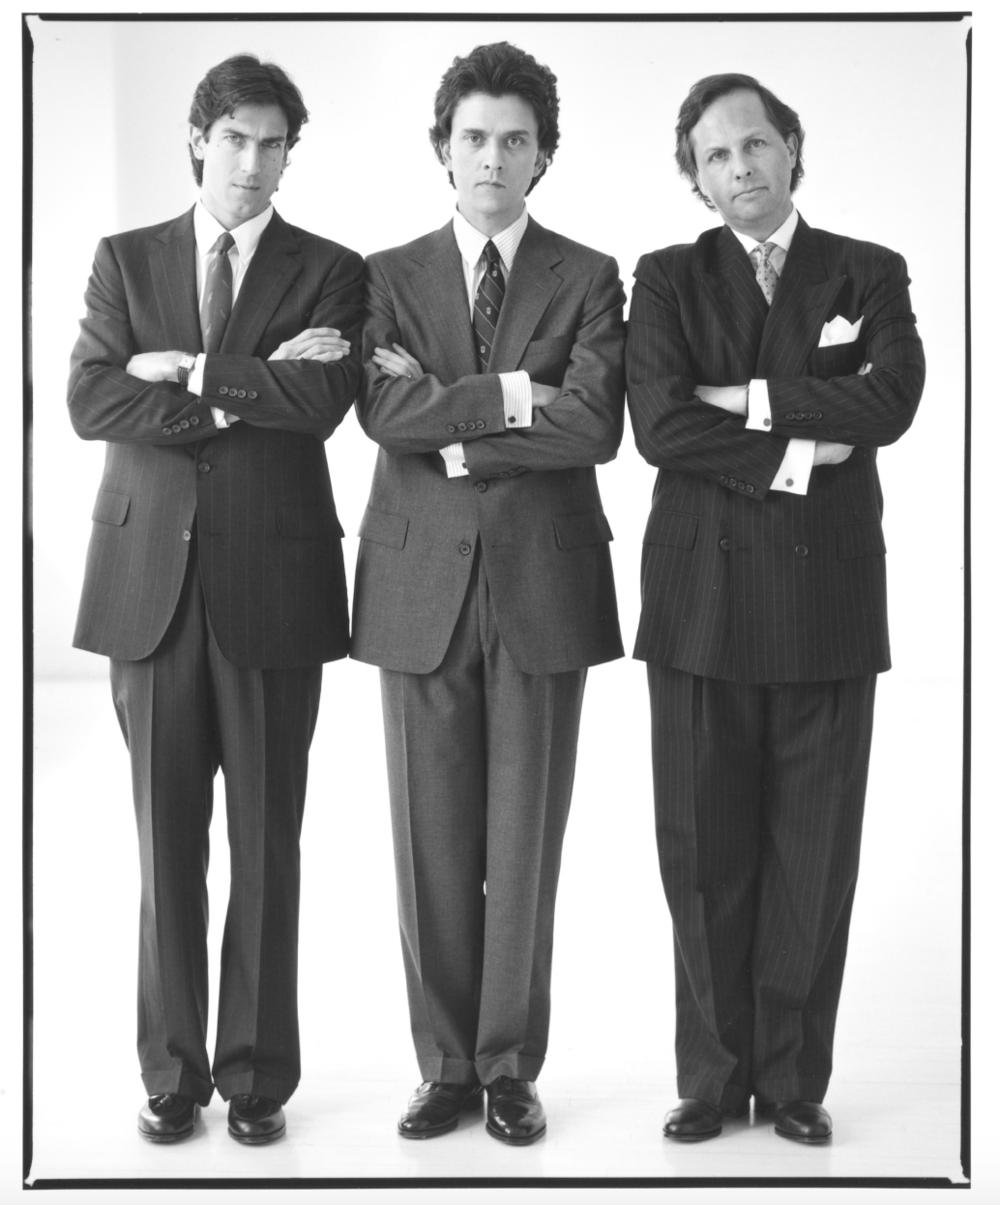 Spy 's founding team: Tom Phillips, Kurt Andersen, and Graydon Carter for Barneys, 1988.  Photo by Annie Leibowitz